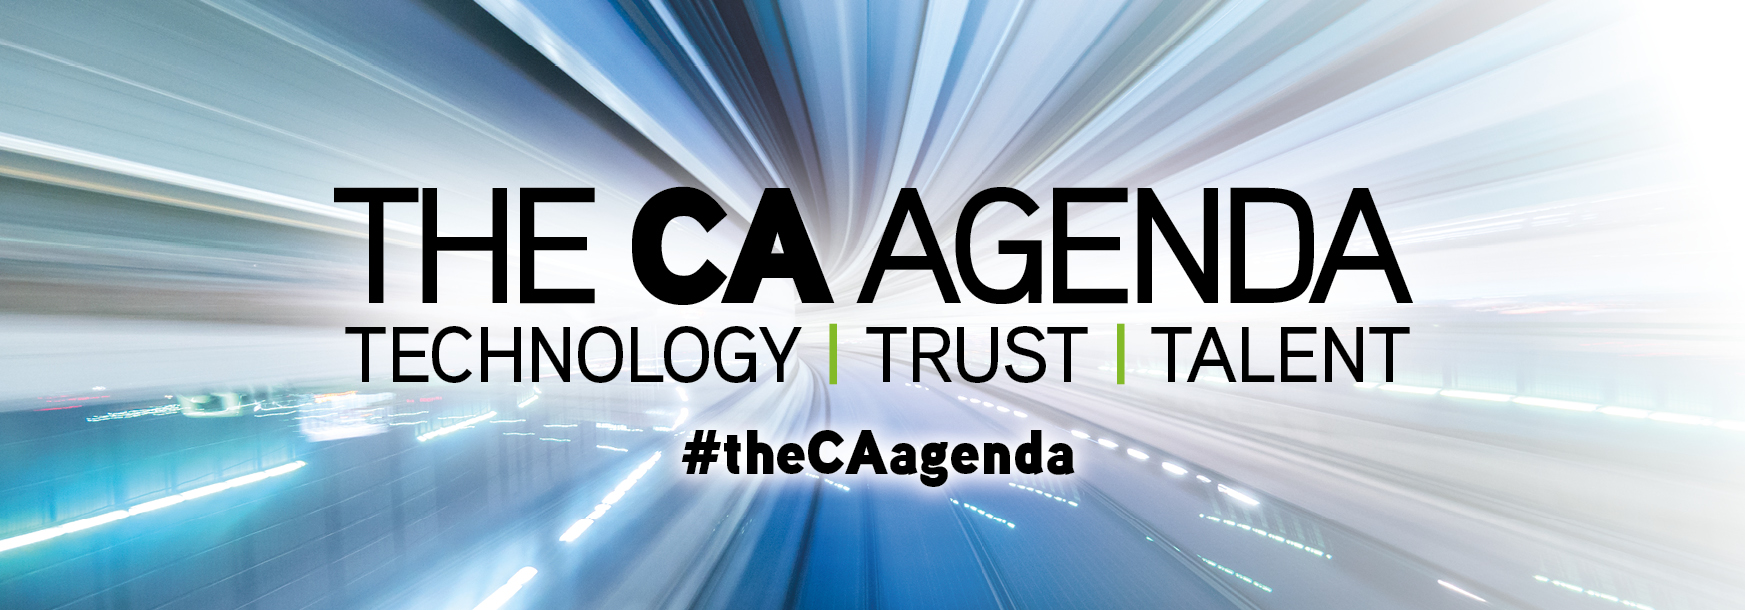 The CA Agenda